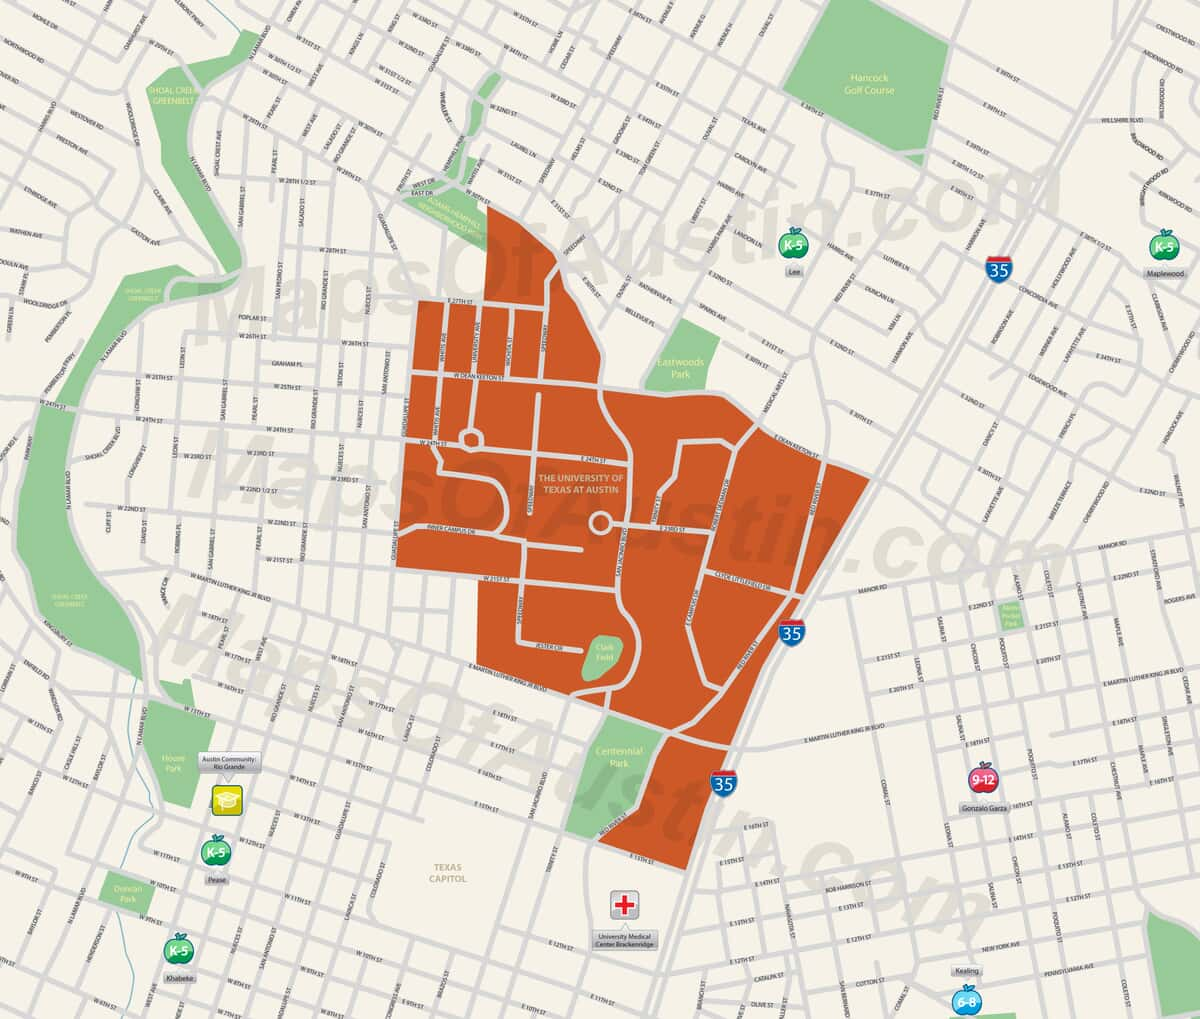 Map Of Texas University Austin.University Of Texas At Austin Austin Tx University Of Texas At